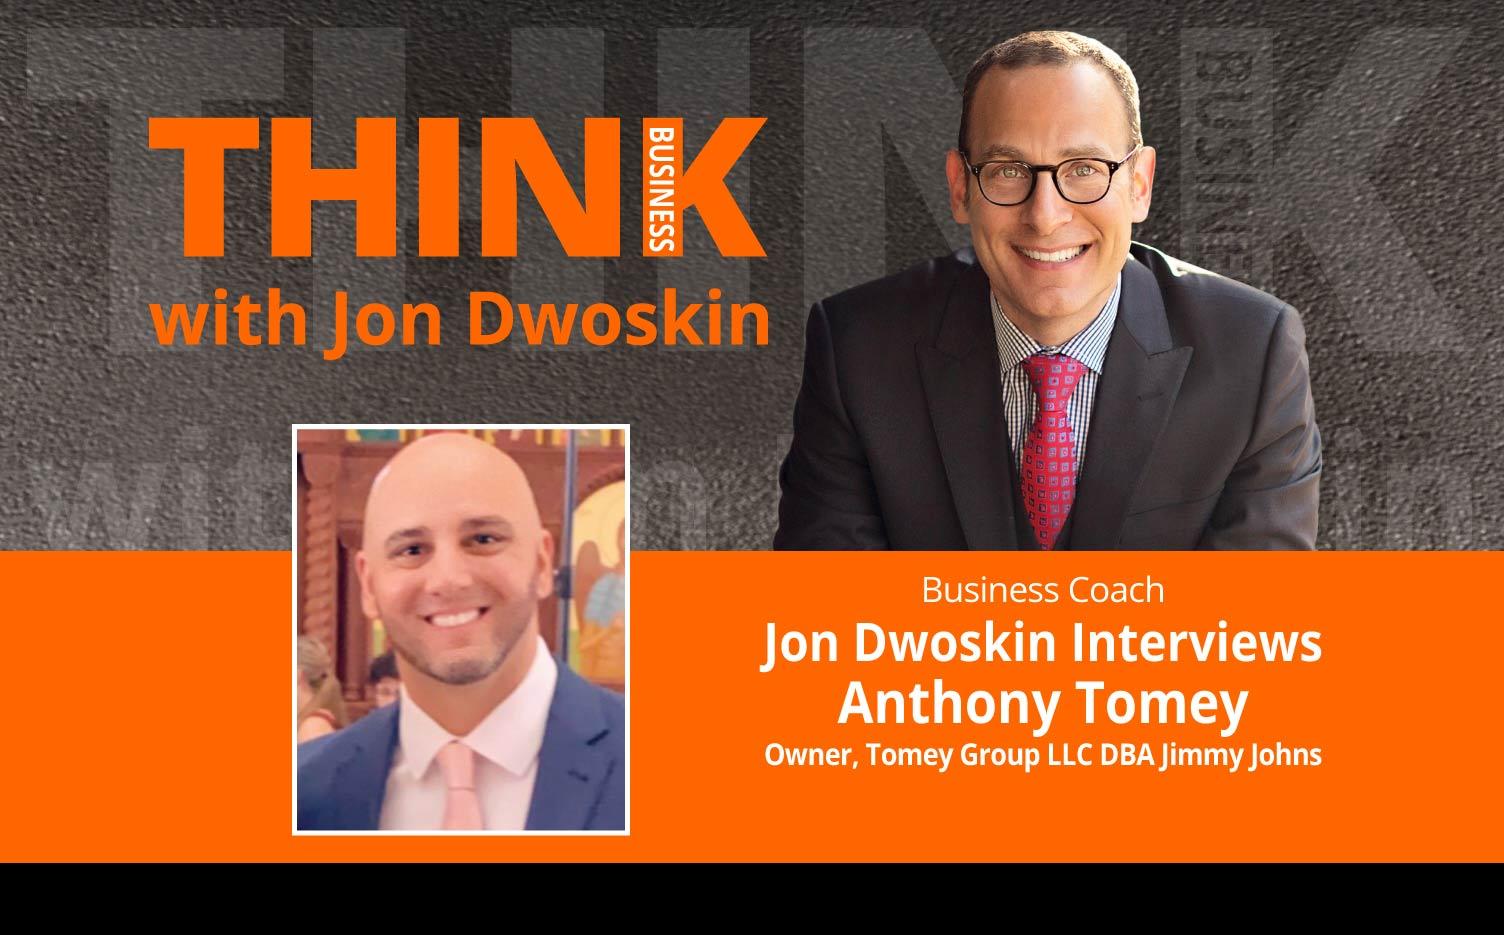 THINK Business Podcast: Jon Dwoskin Interviews Anthony Tomey, Owner, Tomey Group LLC DBA Jimmy Johns